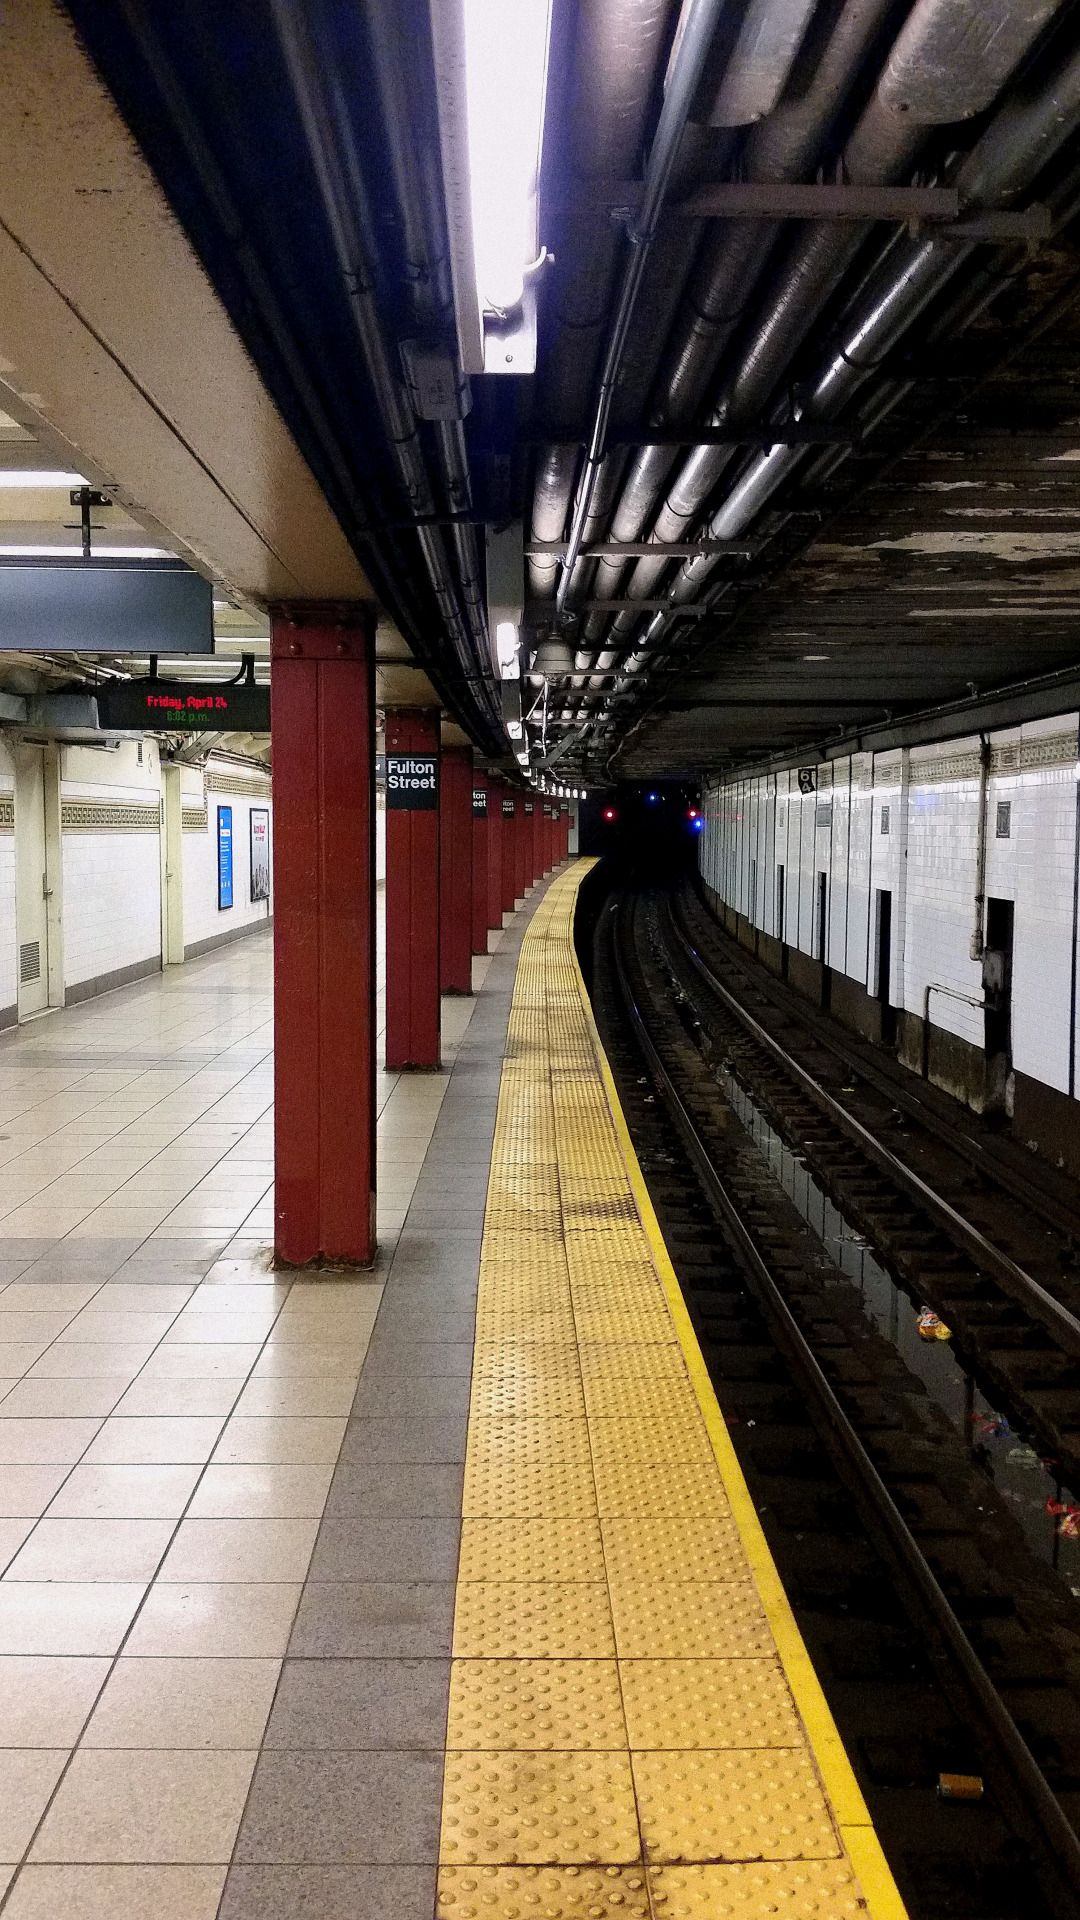 New York City Subway image by Bruce Salinger Fulton